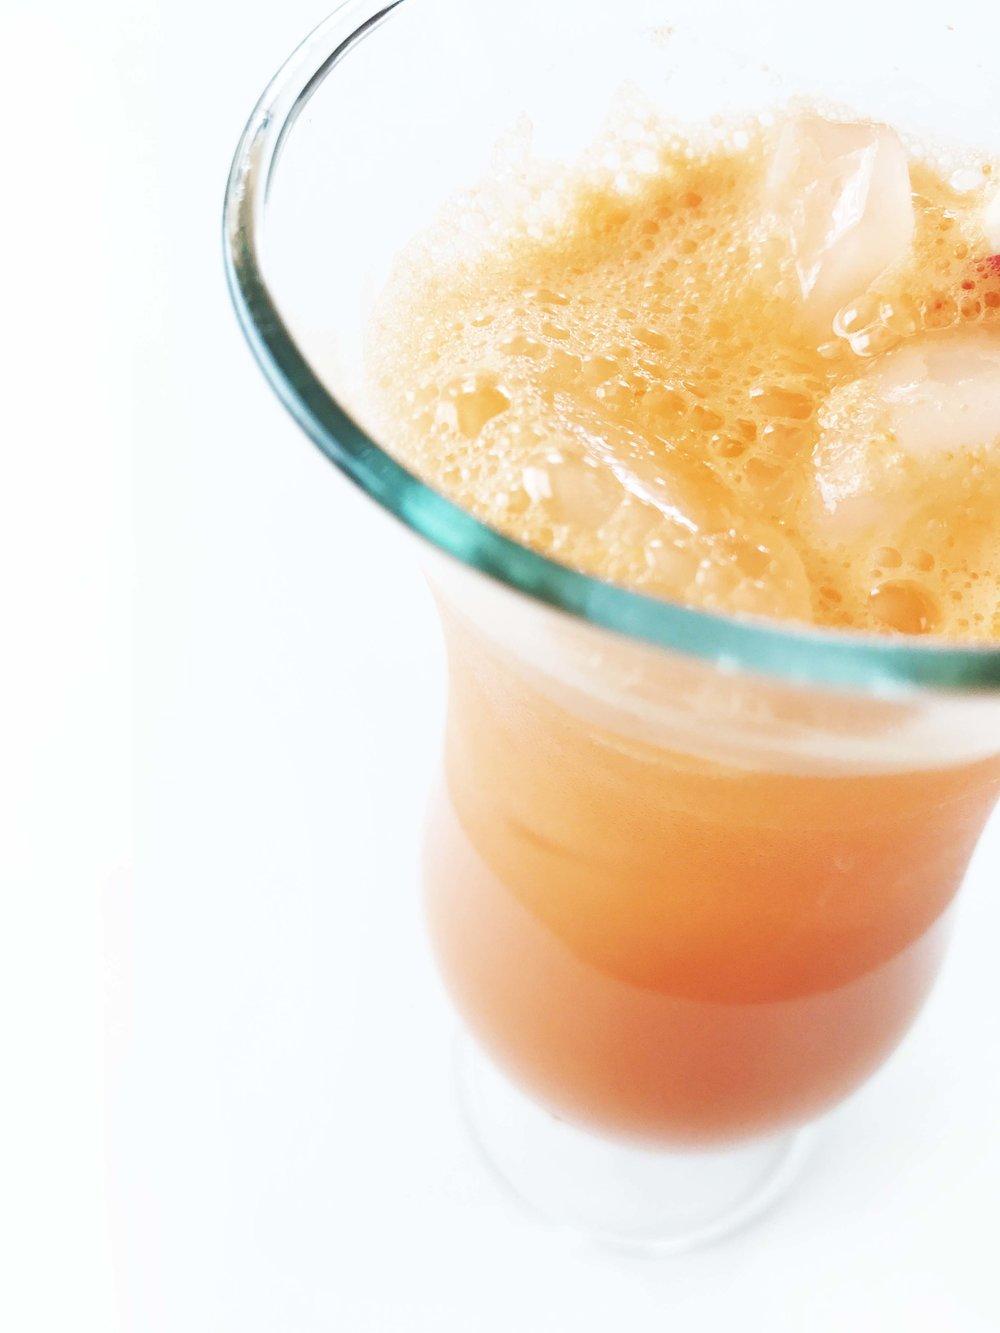 carrot-juice9.jpg